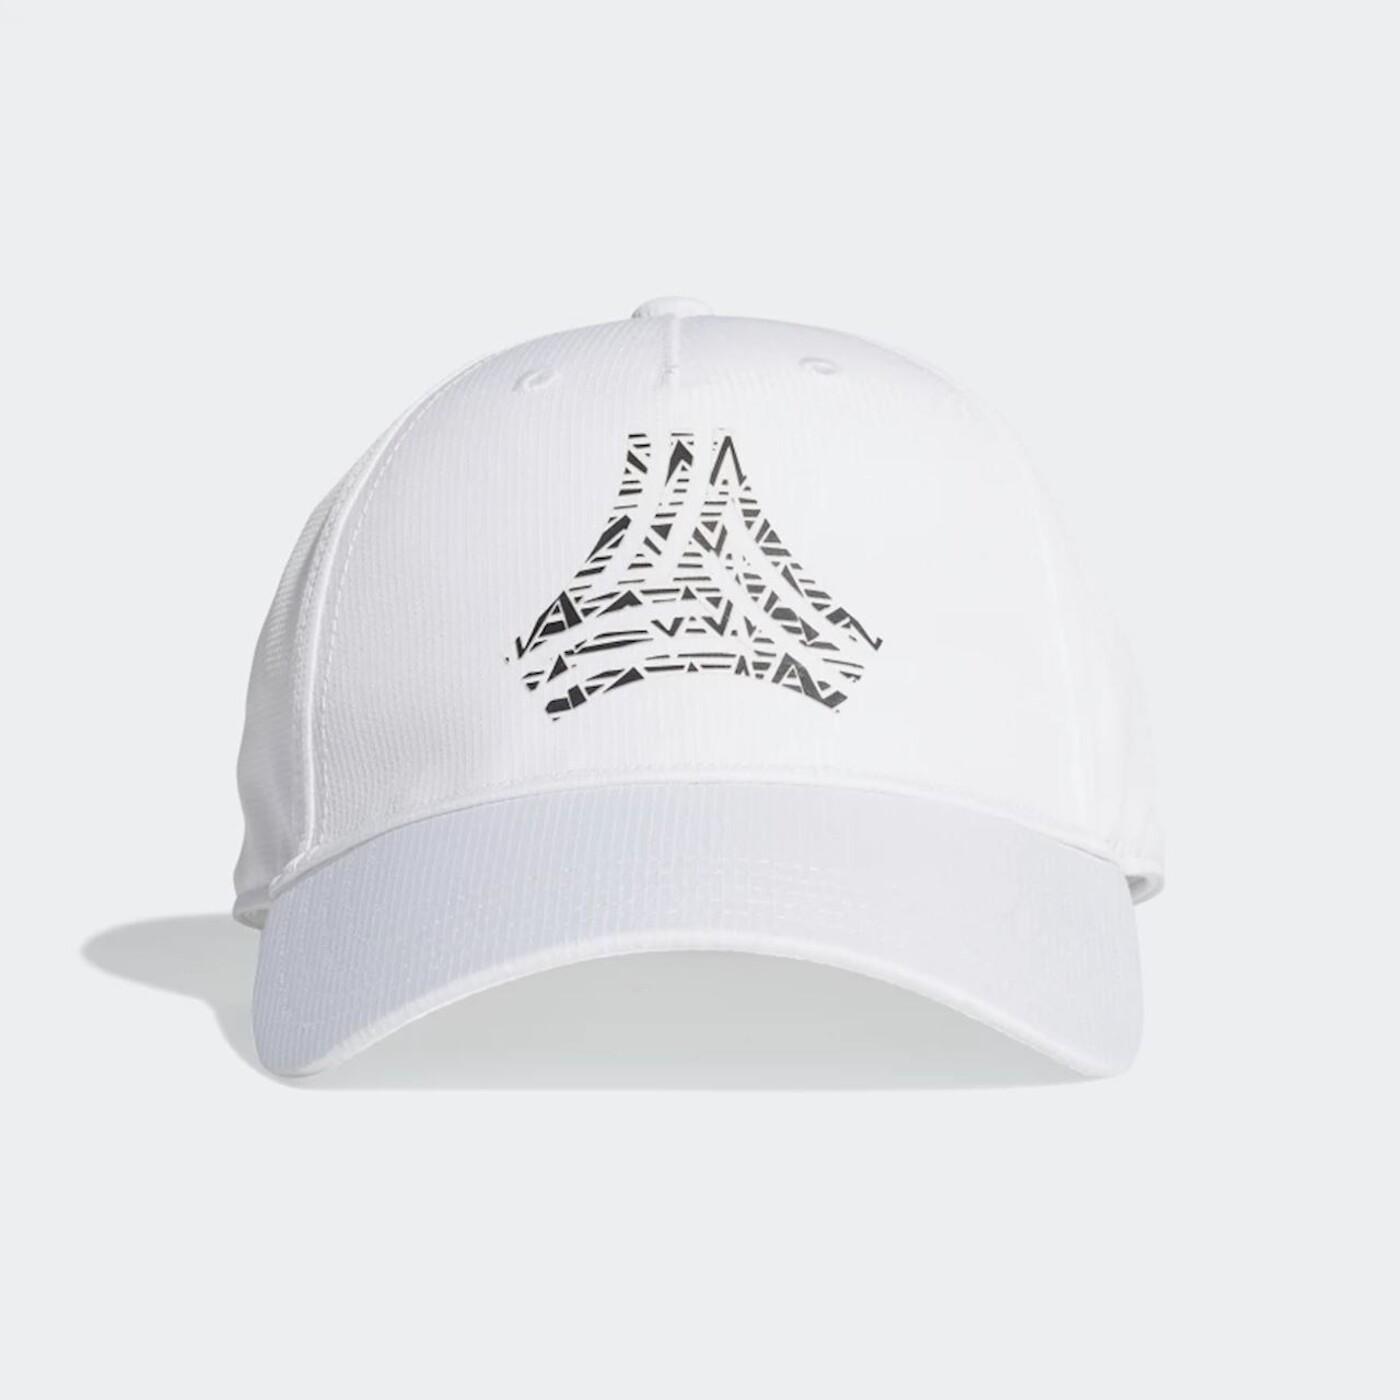 ADIDAS FS BB CAP BST - Herren